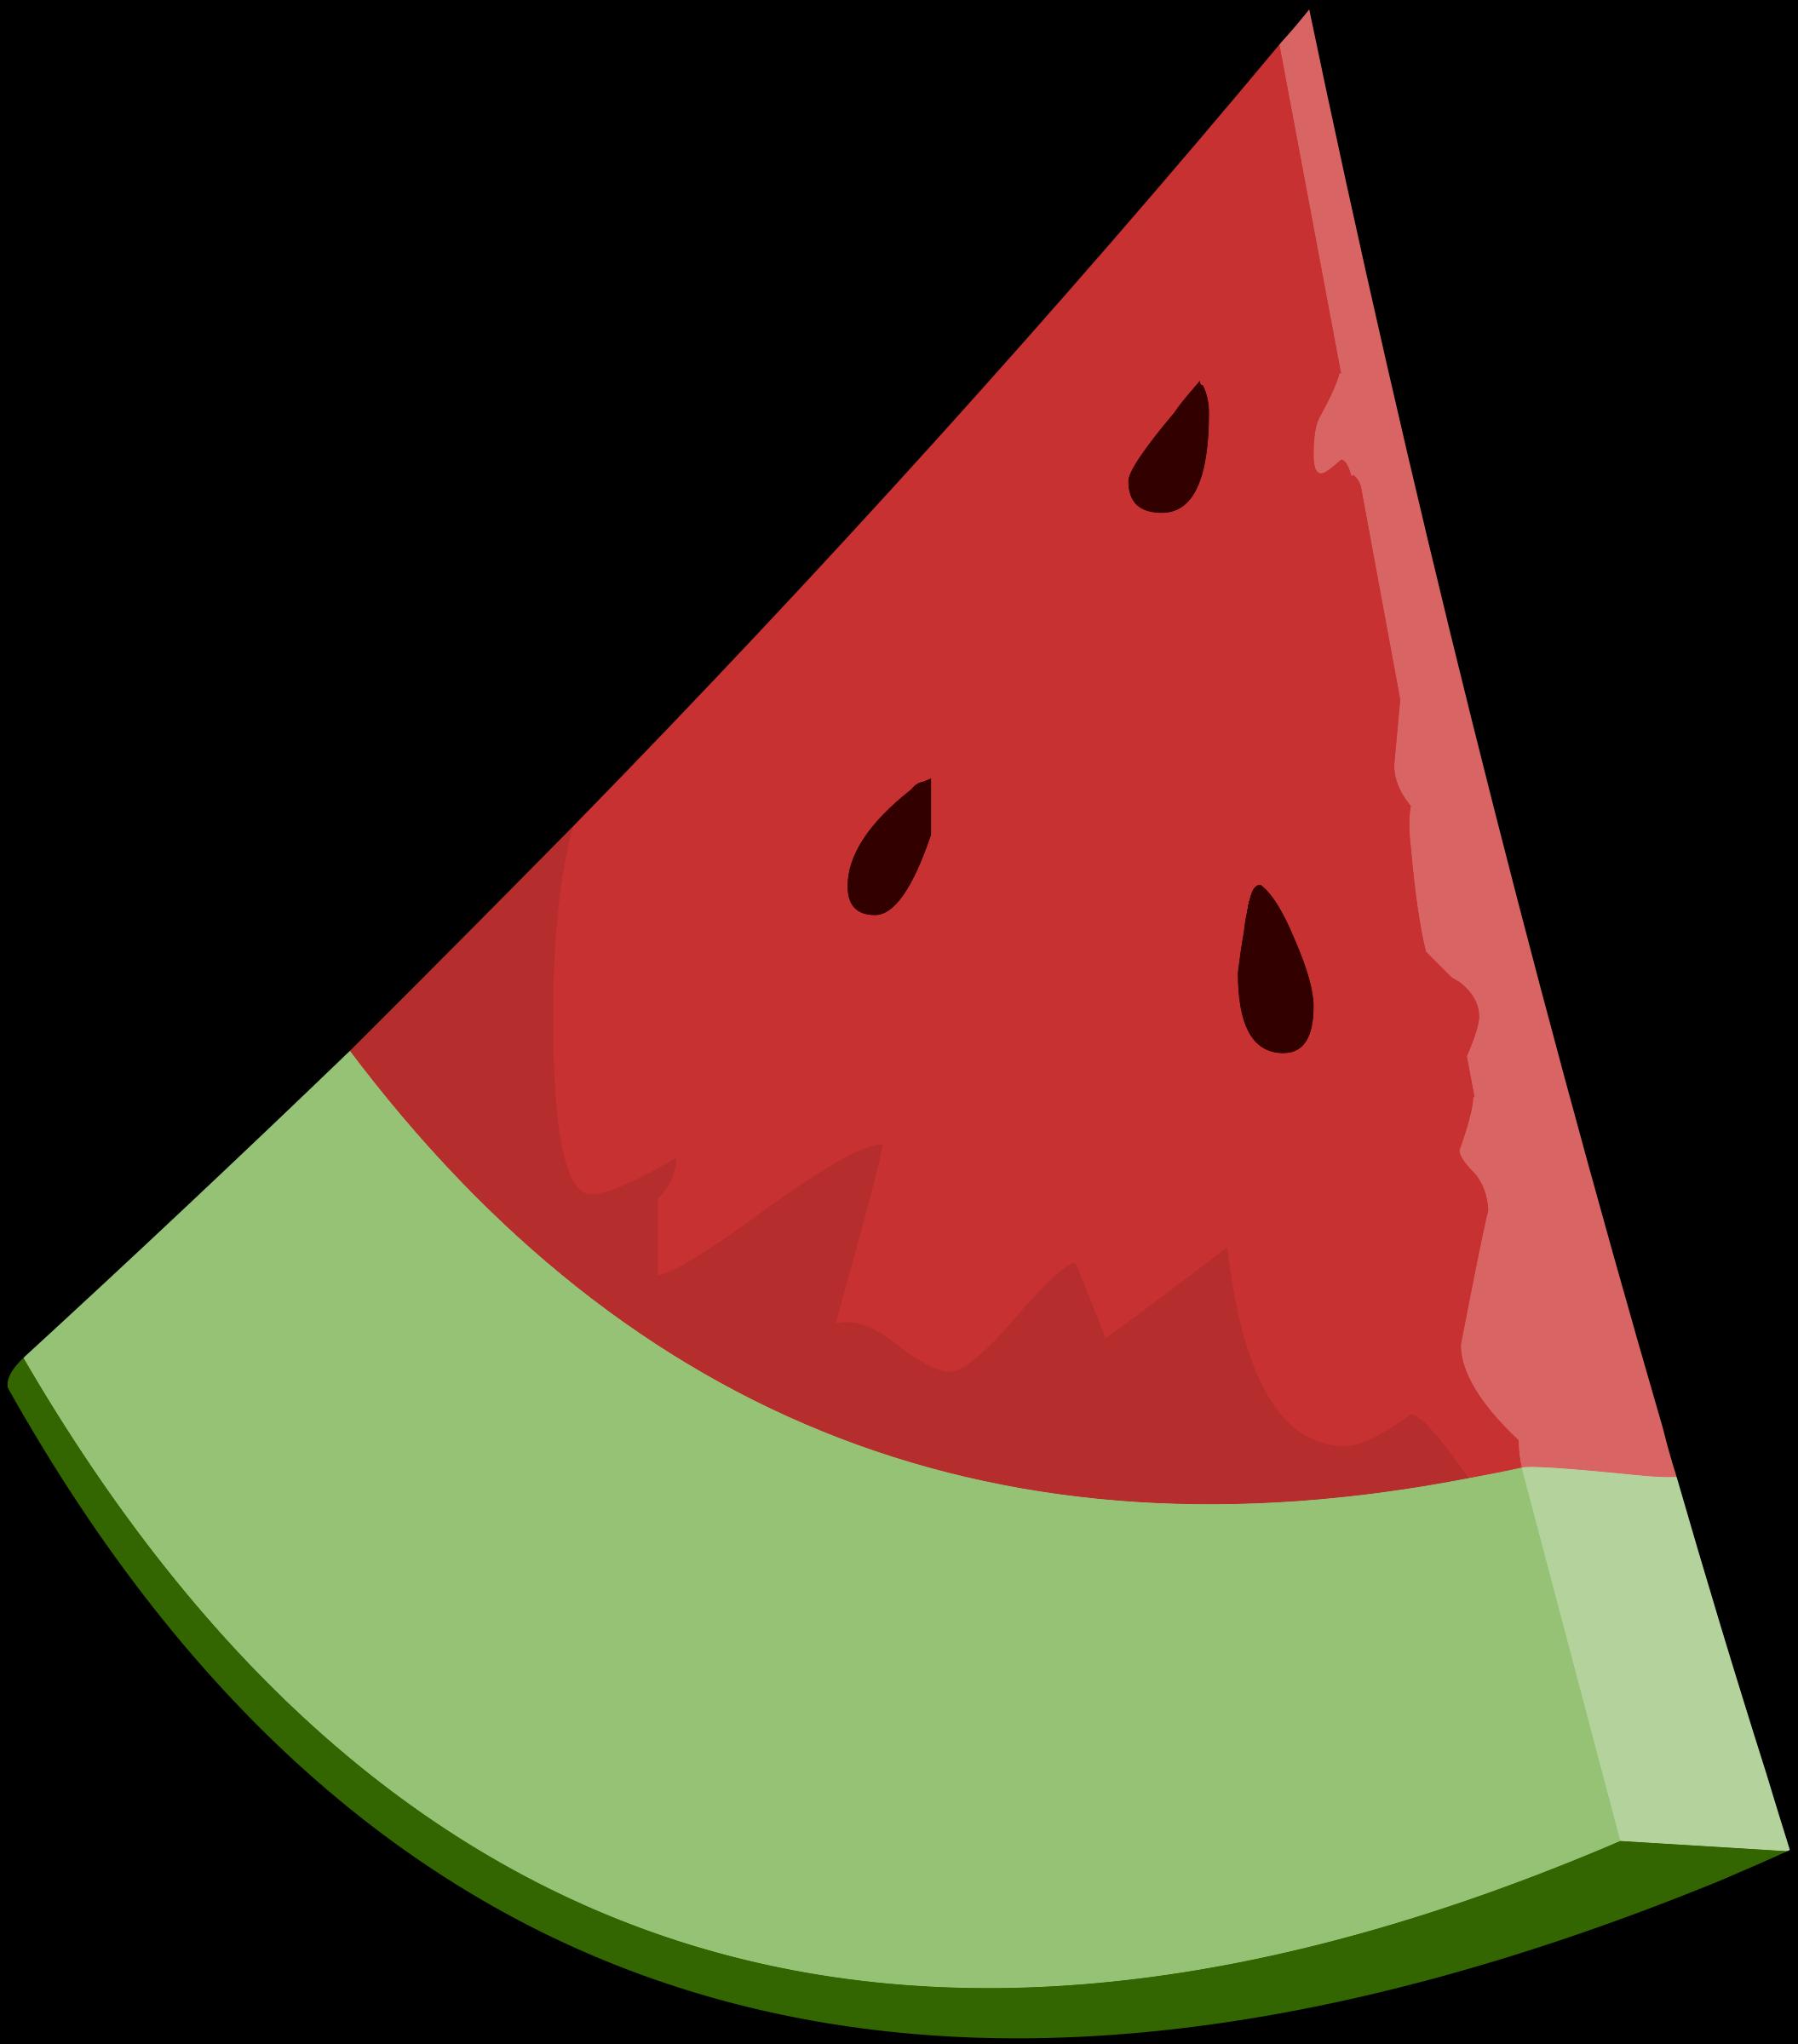 Clipart panda apple vector Seeds Clipart Watermelon Seed#3890794 vector